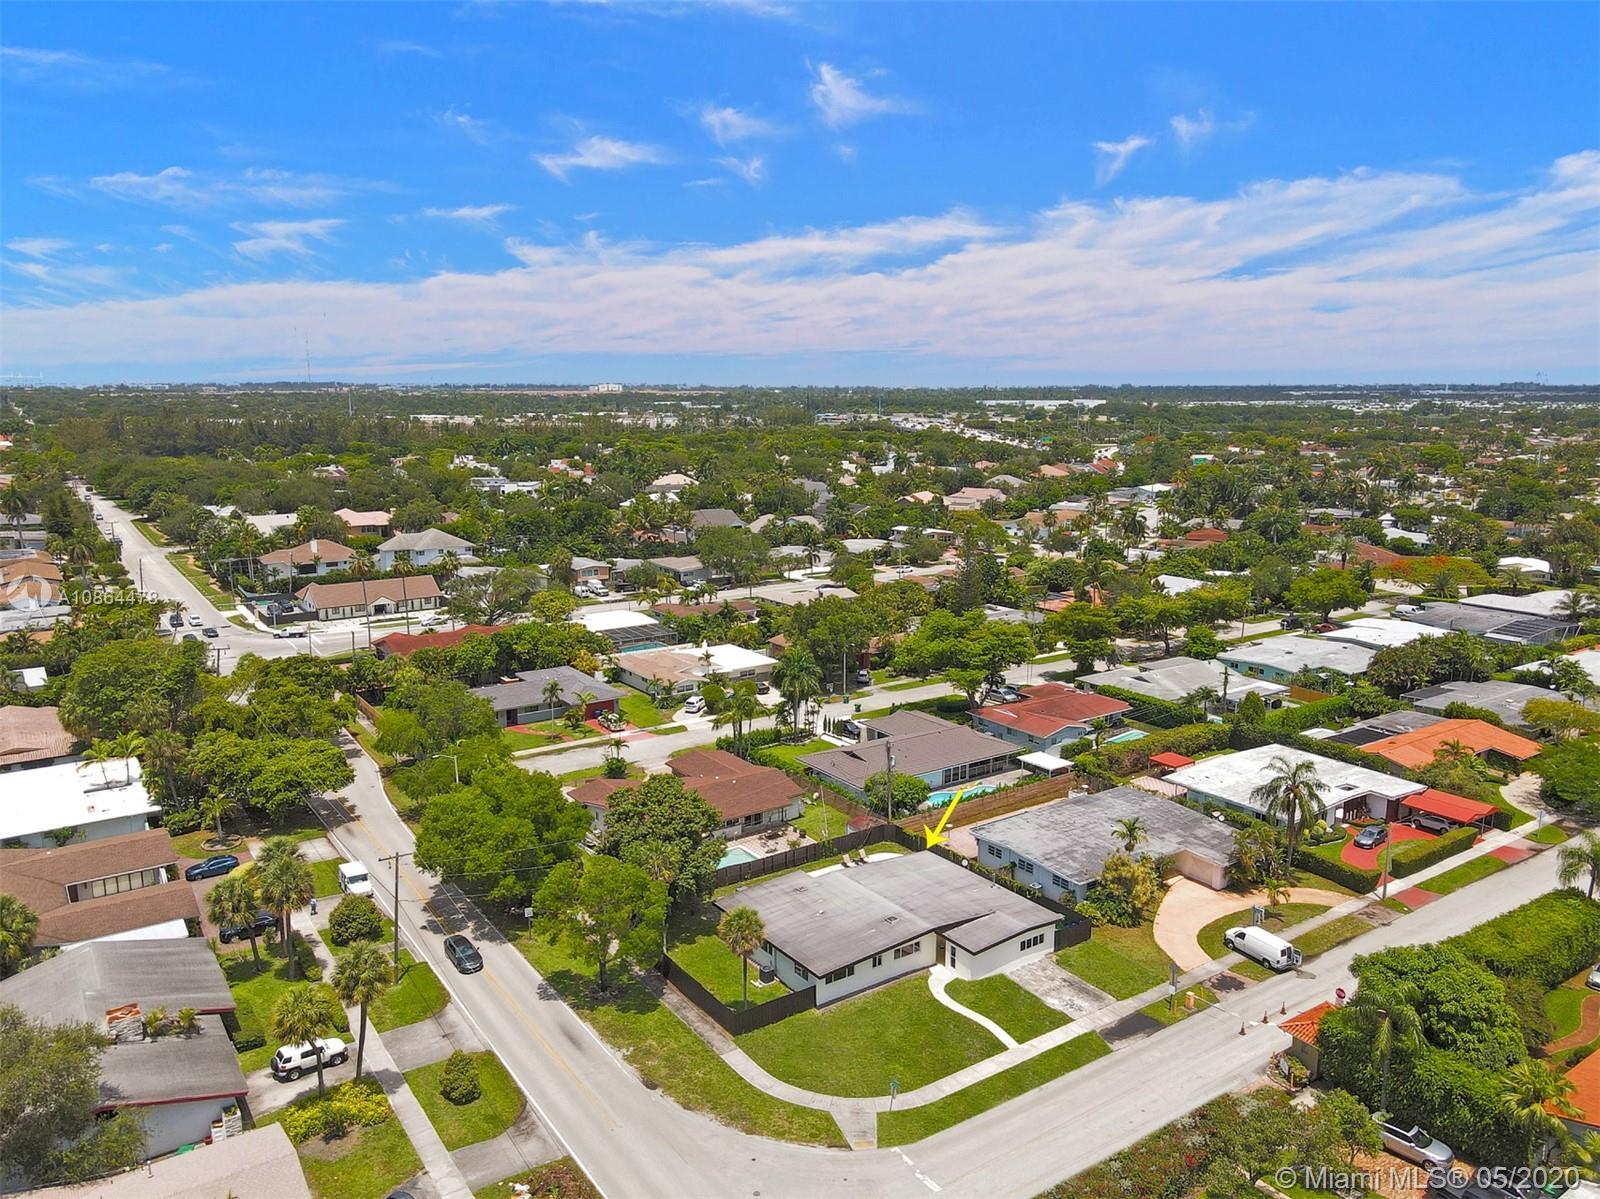 19900 NE 21st Ave Property Photo - Miami, FL real estate listing